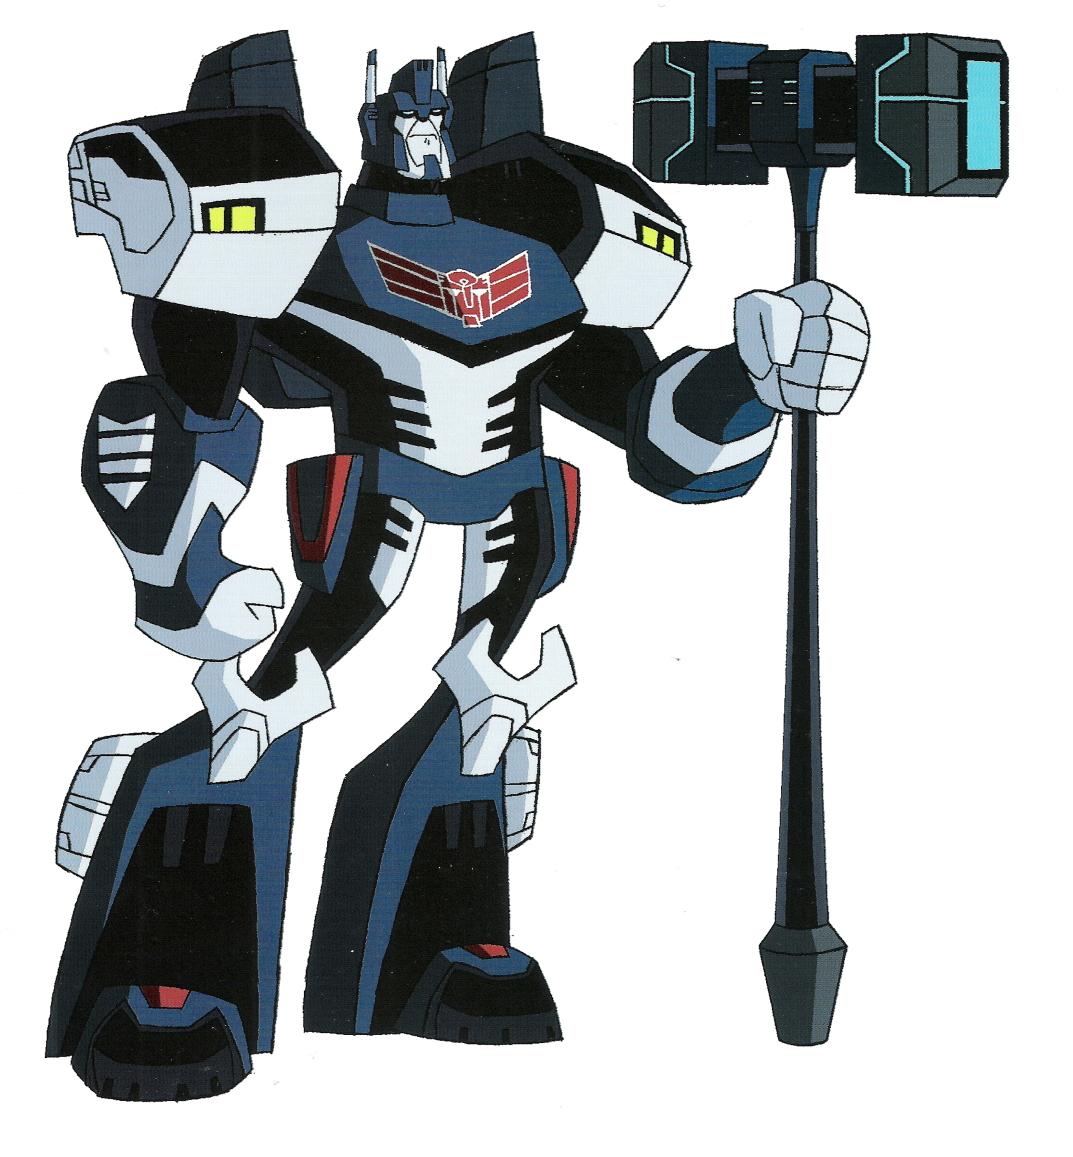 ultra magnus (tfa) | teletraan i: the transformers wiki | fandom